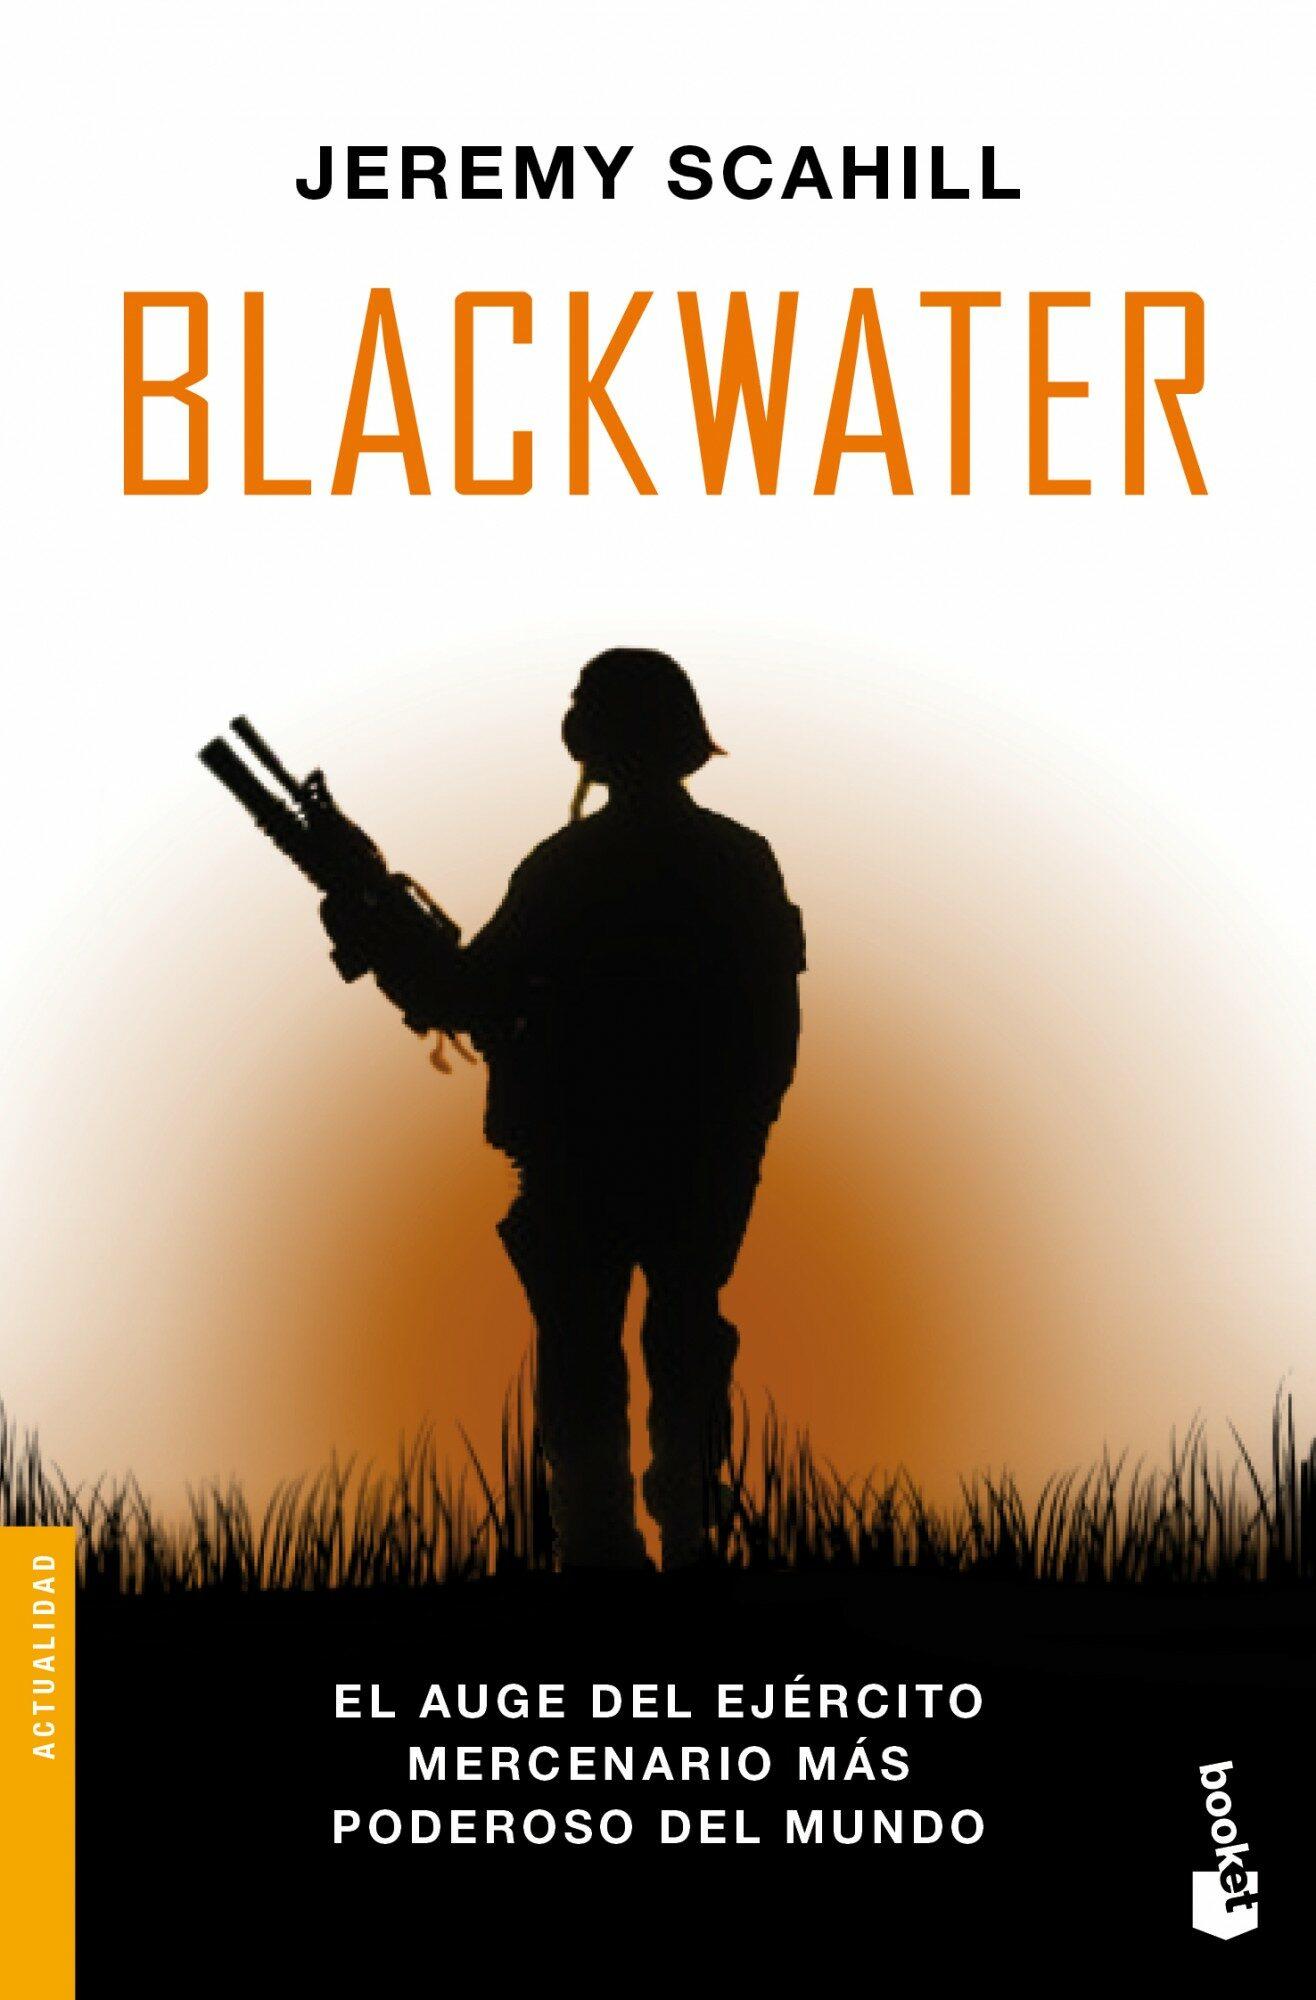 blackwater: el auge del ejercito mercenario mas poderoso del mund o-jeremy scahill-9788408004240